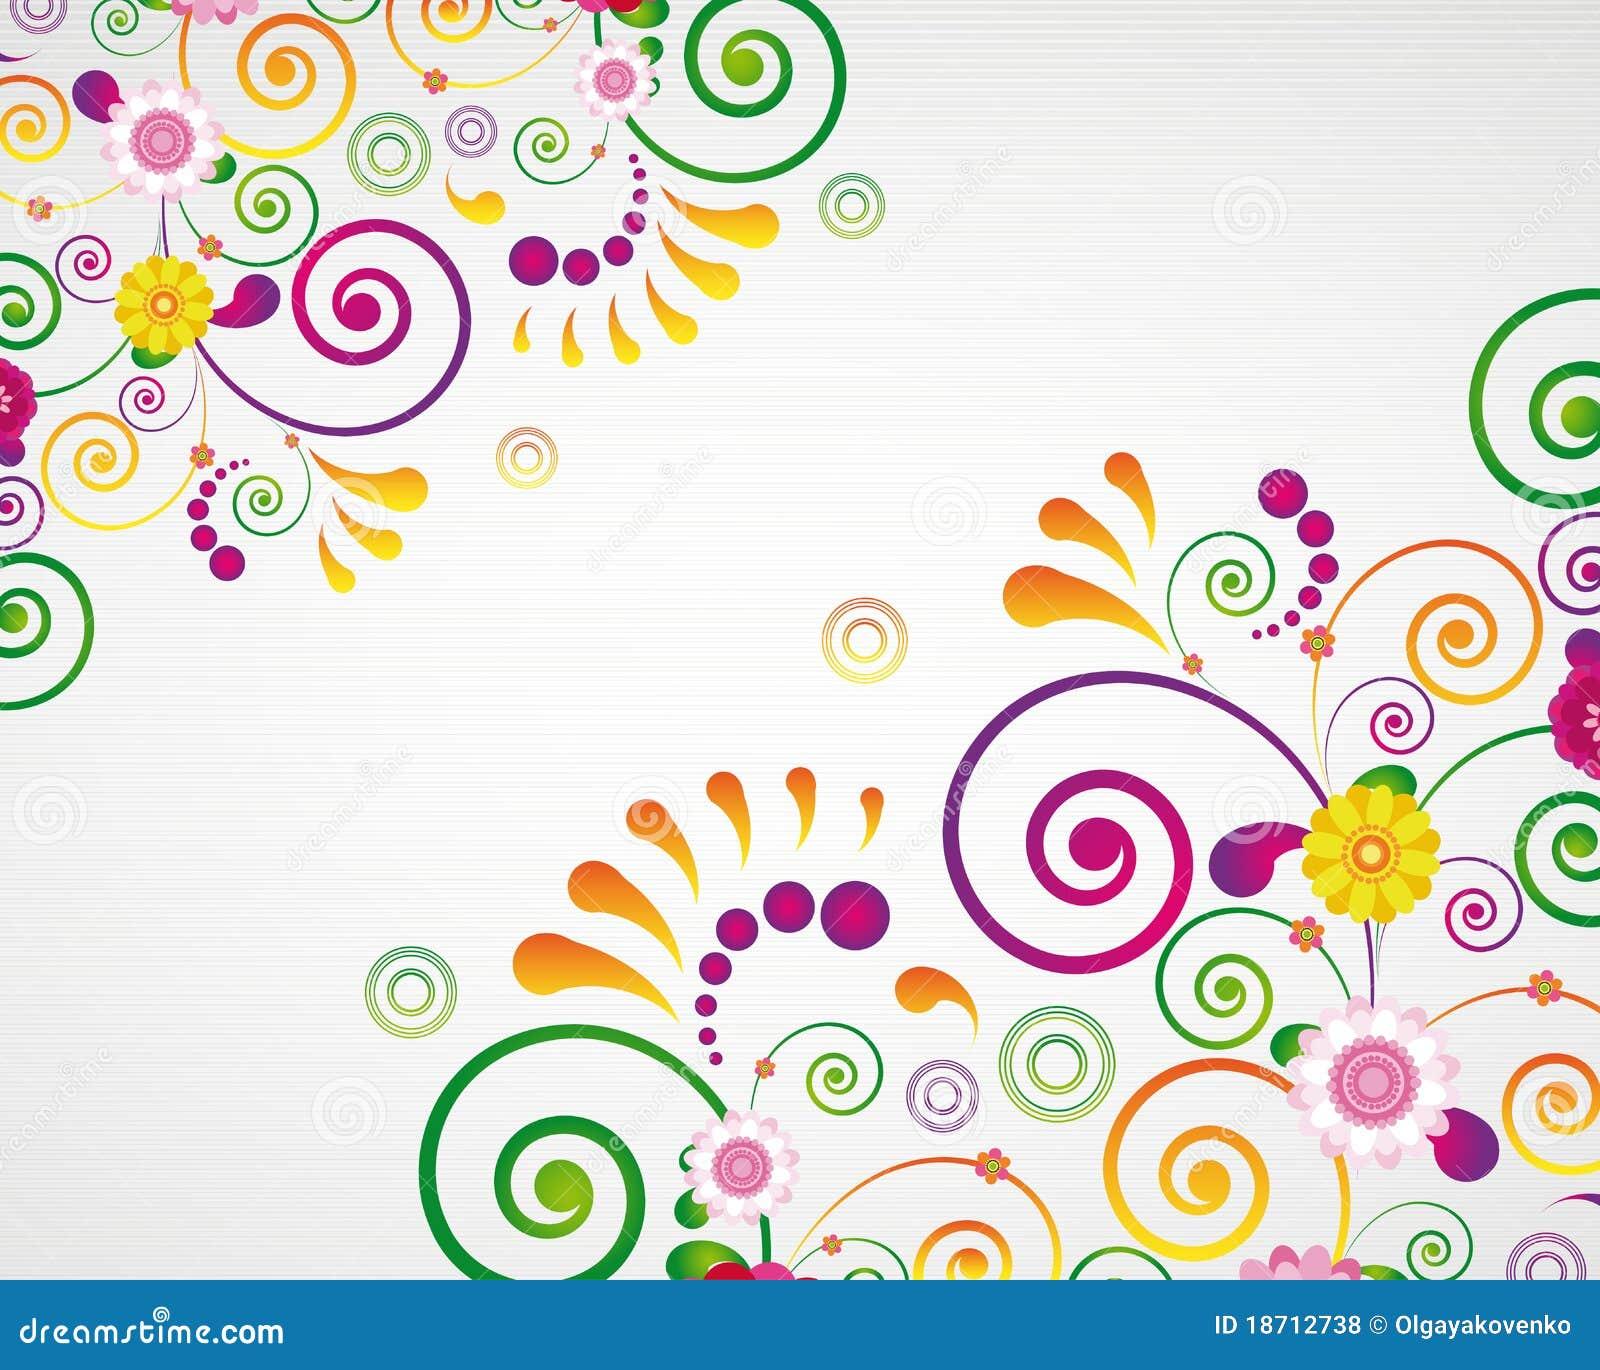 diwali greetings cards hd wallpapers